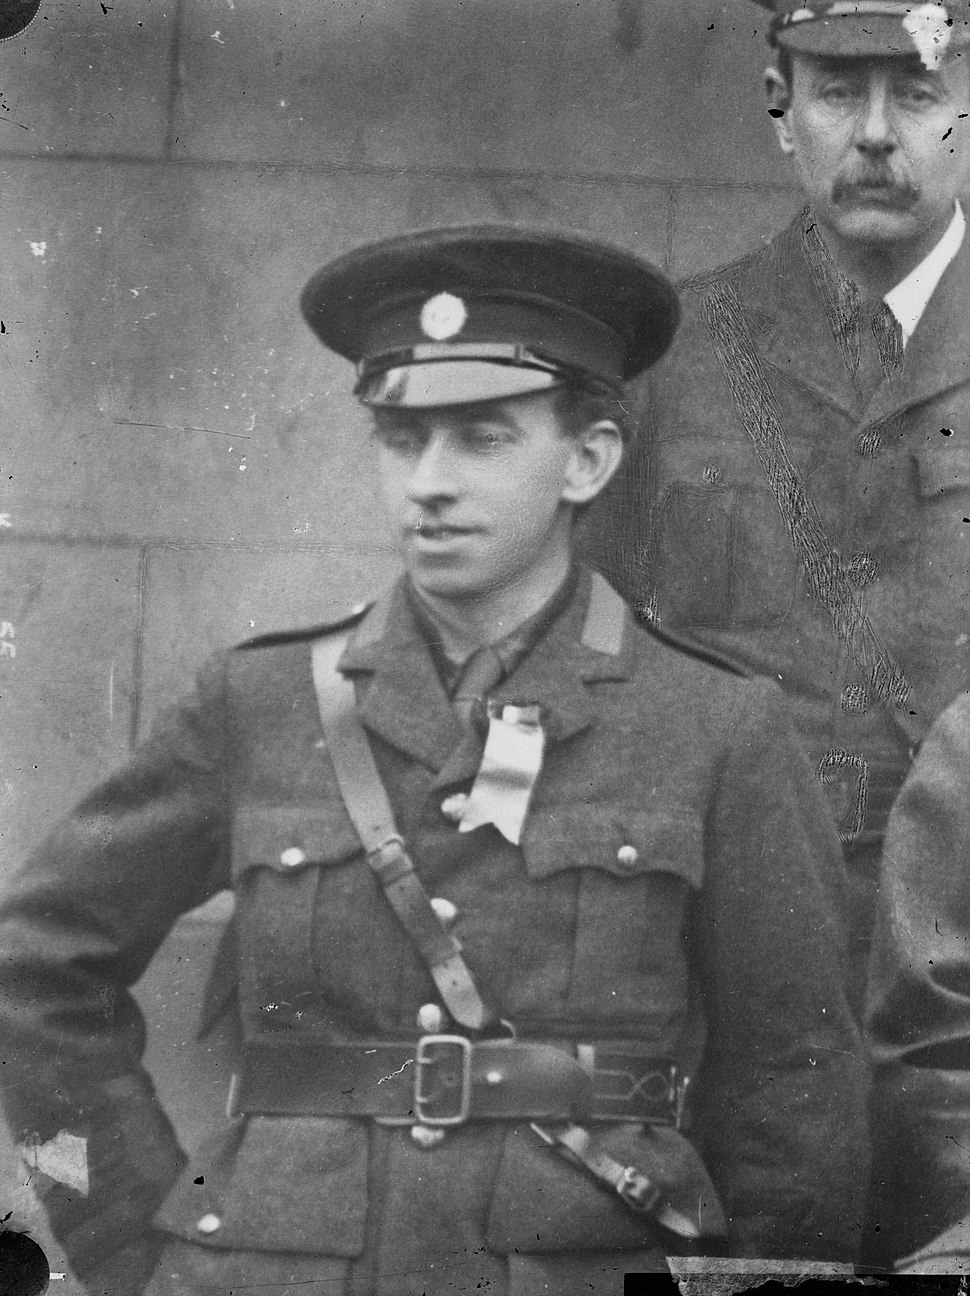 Thomas MacDonagh in uniform, half-length portrait (24469972256)